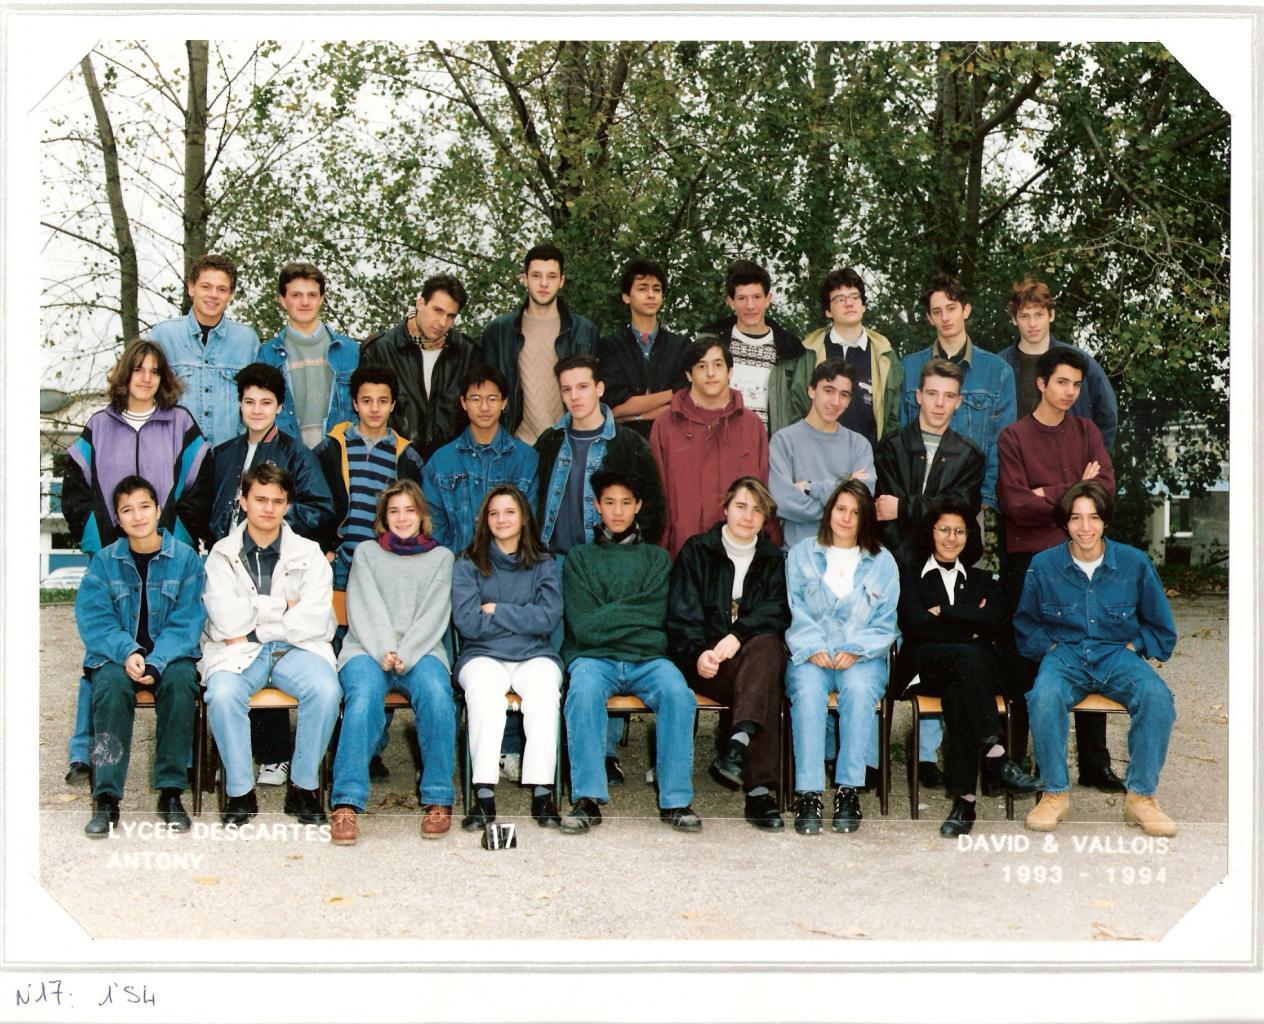 1994 - 1S4